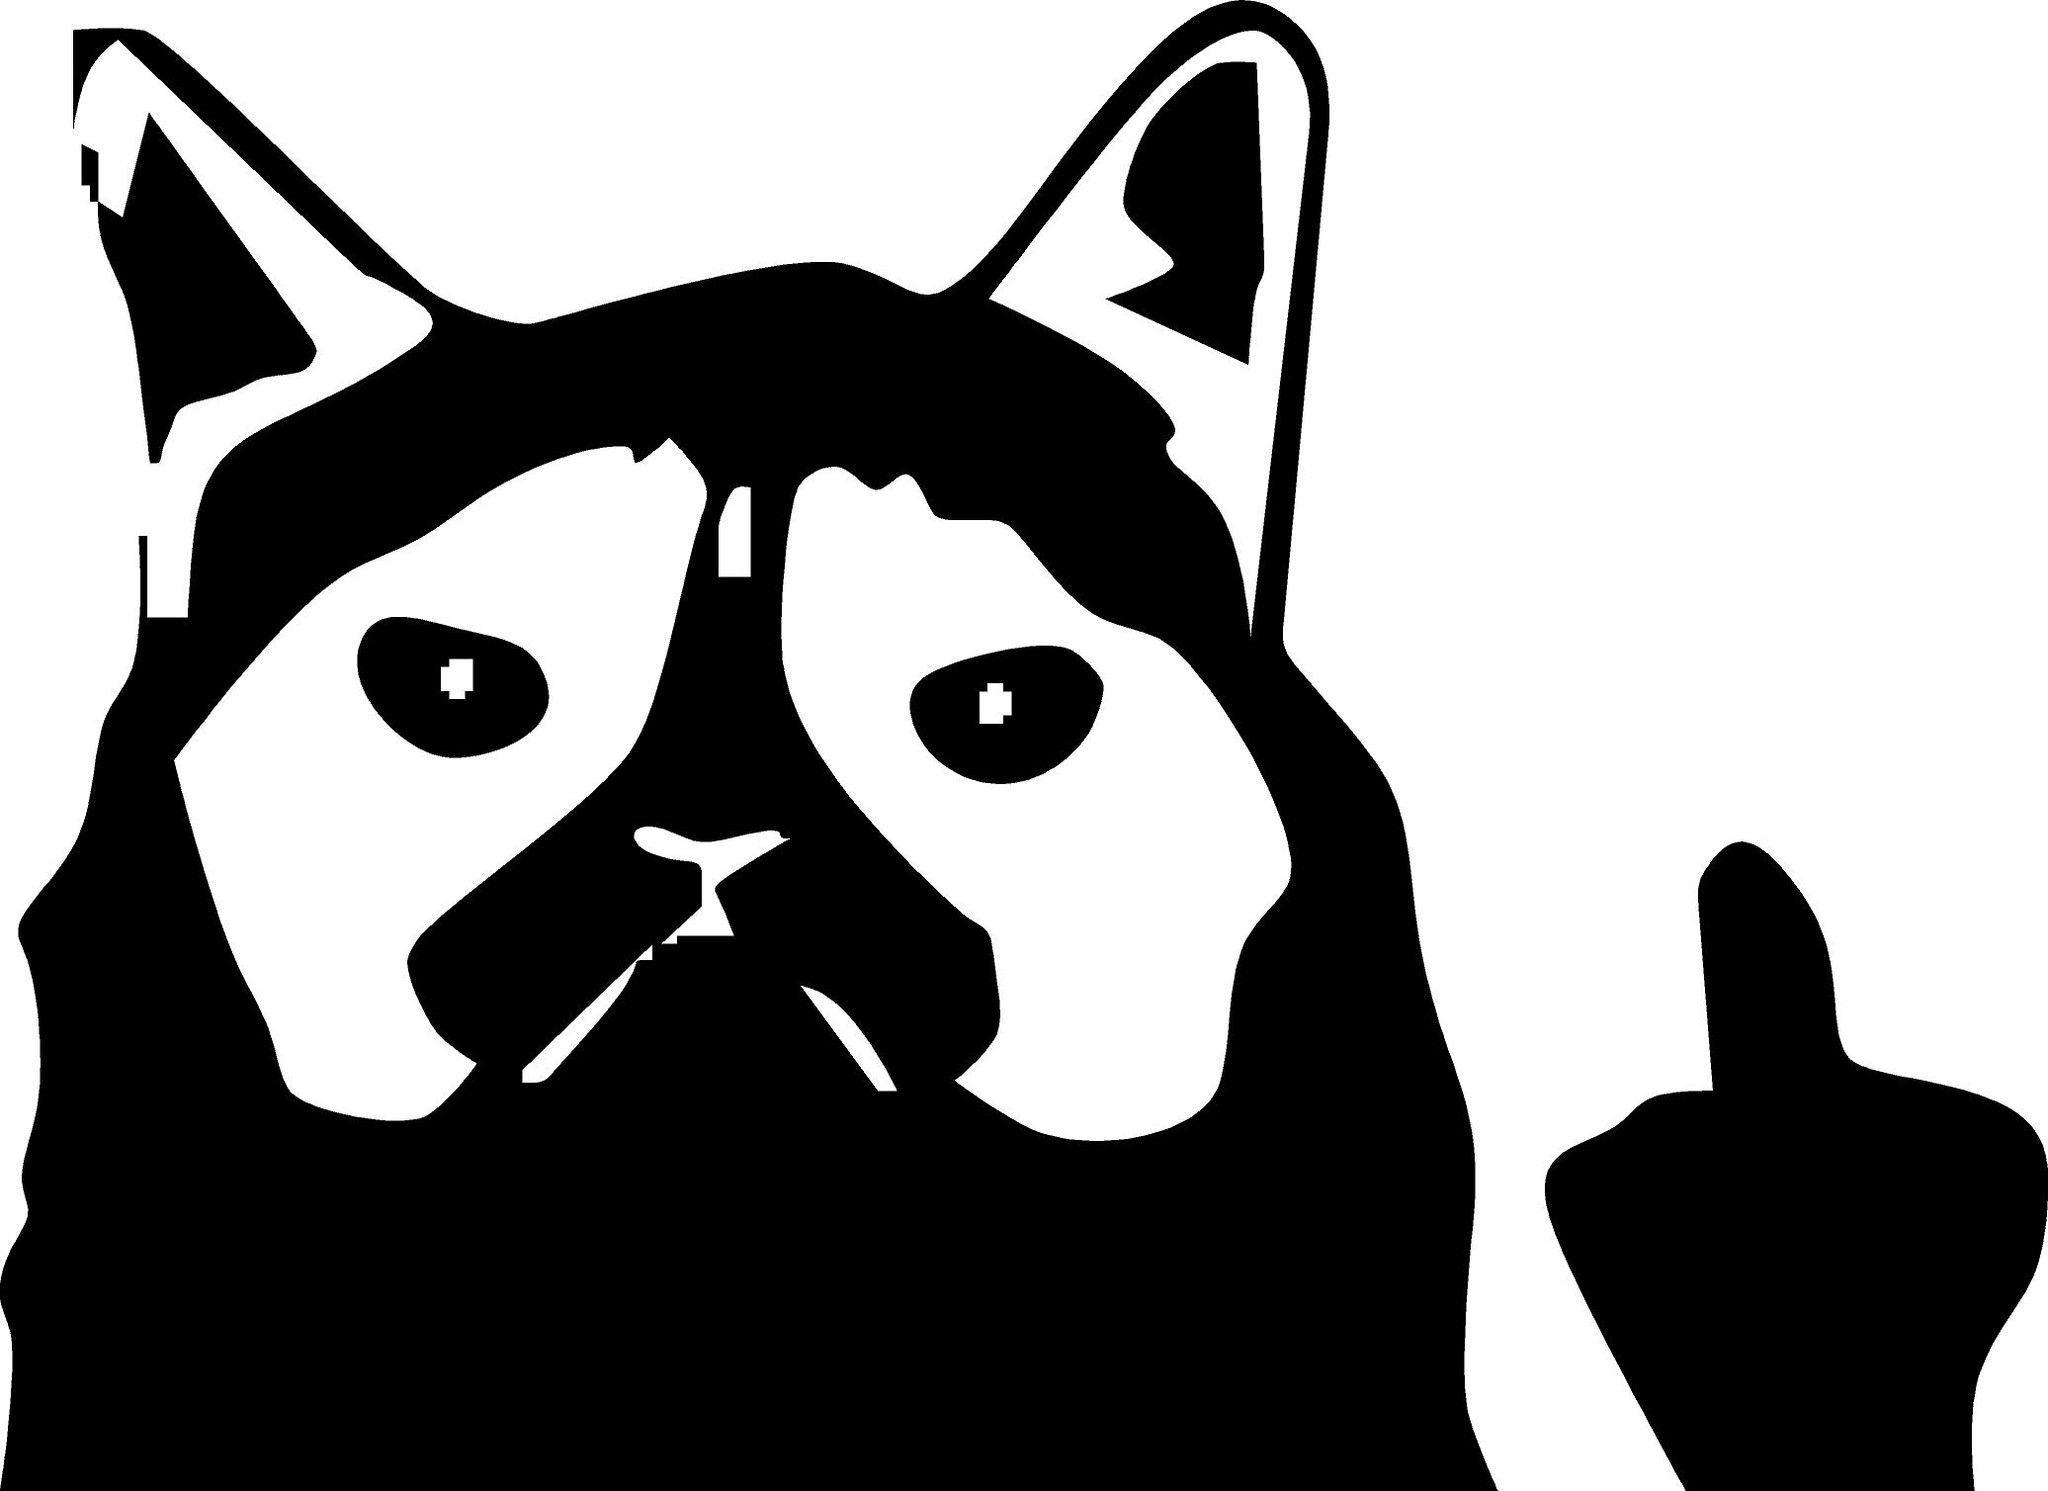 Grumpy Cat Middle Finger Vinyl Decal Grumpy Cat Pinterest - Vinyl decal cat pinterest